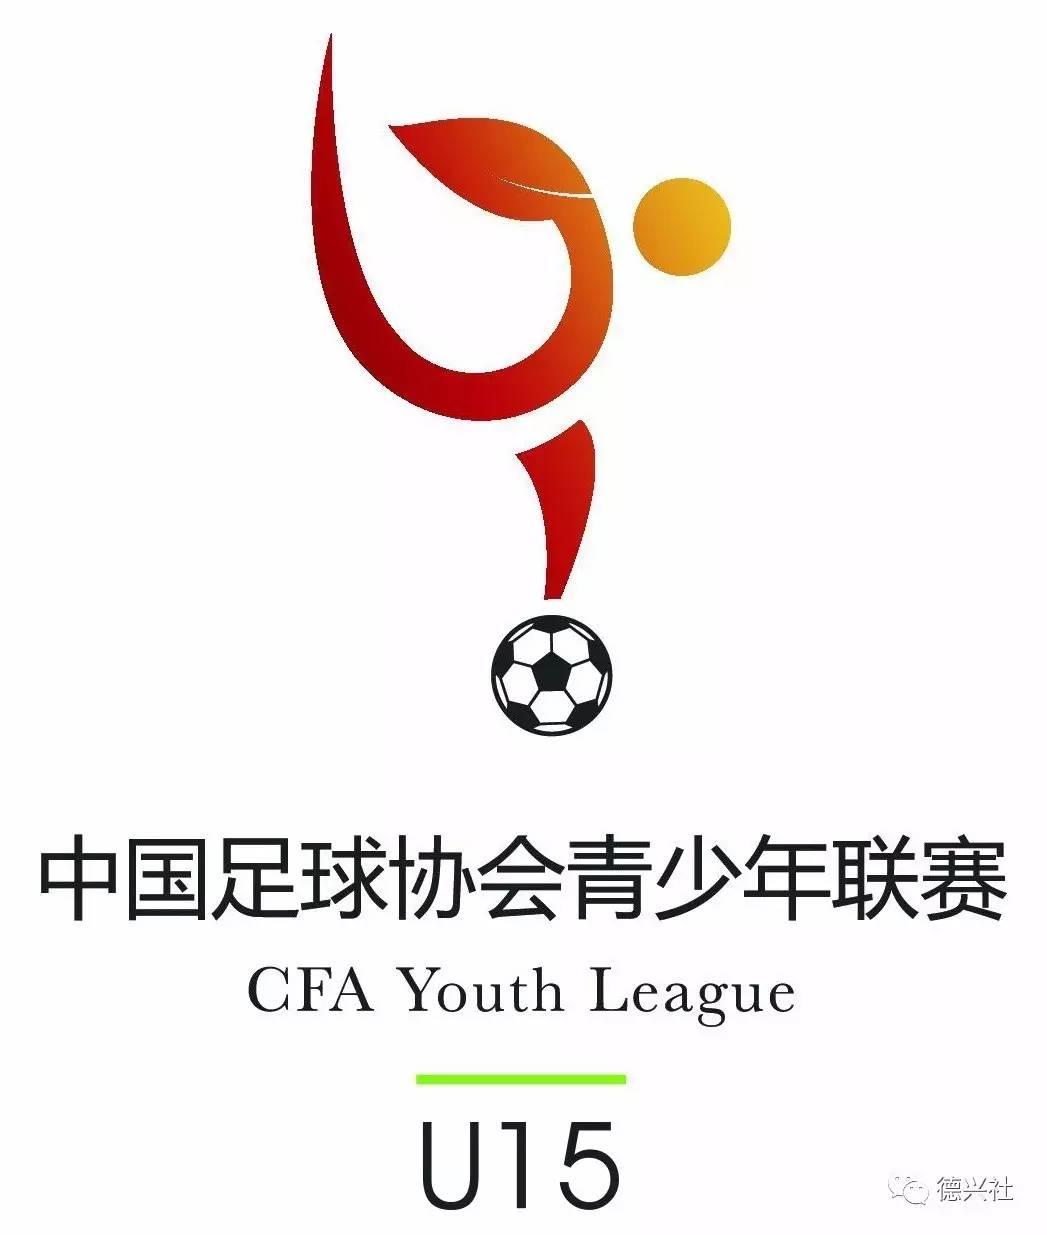 U15联赛第三阶段下半区第五轮●青岛中能胜北海九中居首位 将与武汉六中争第13名